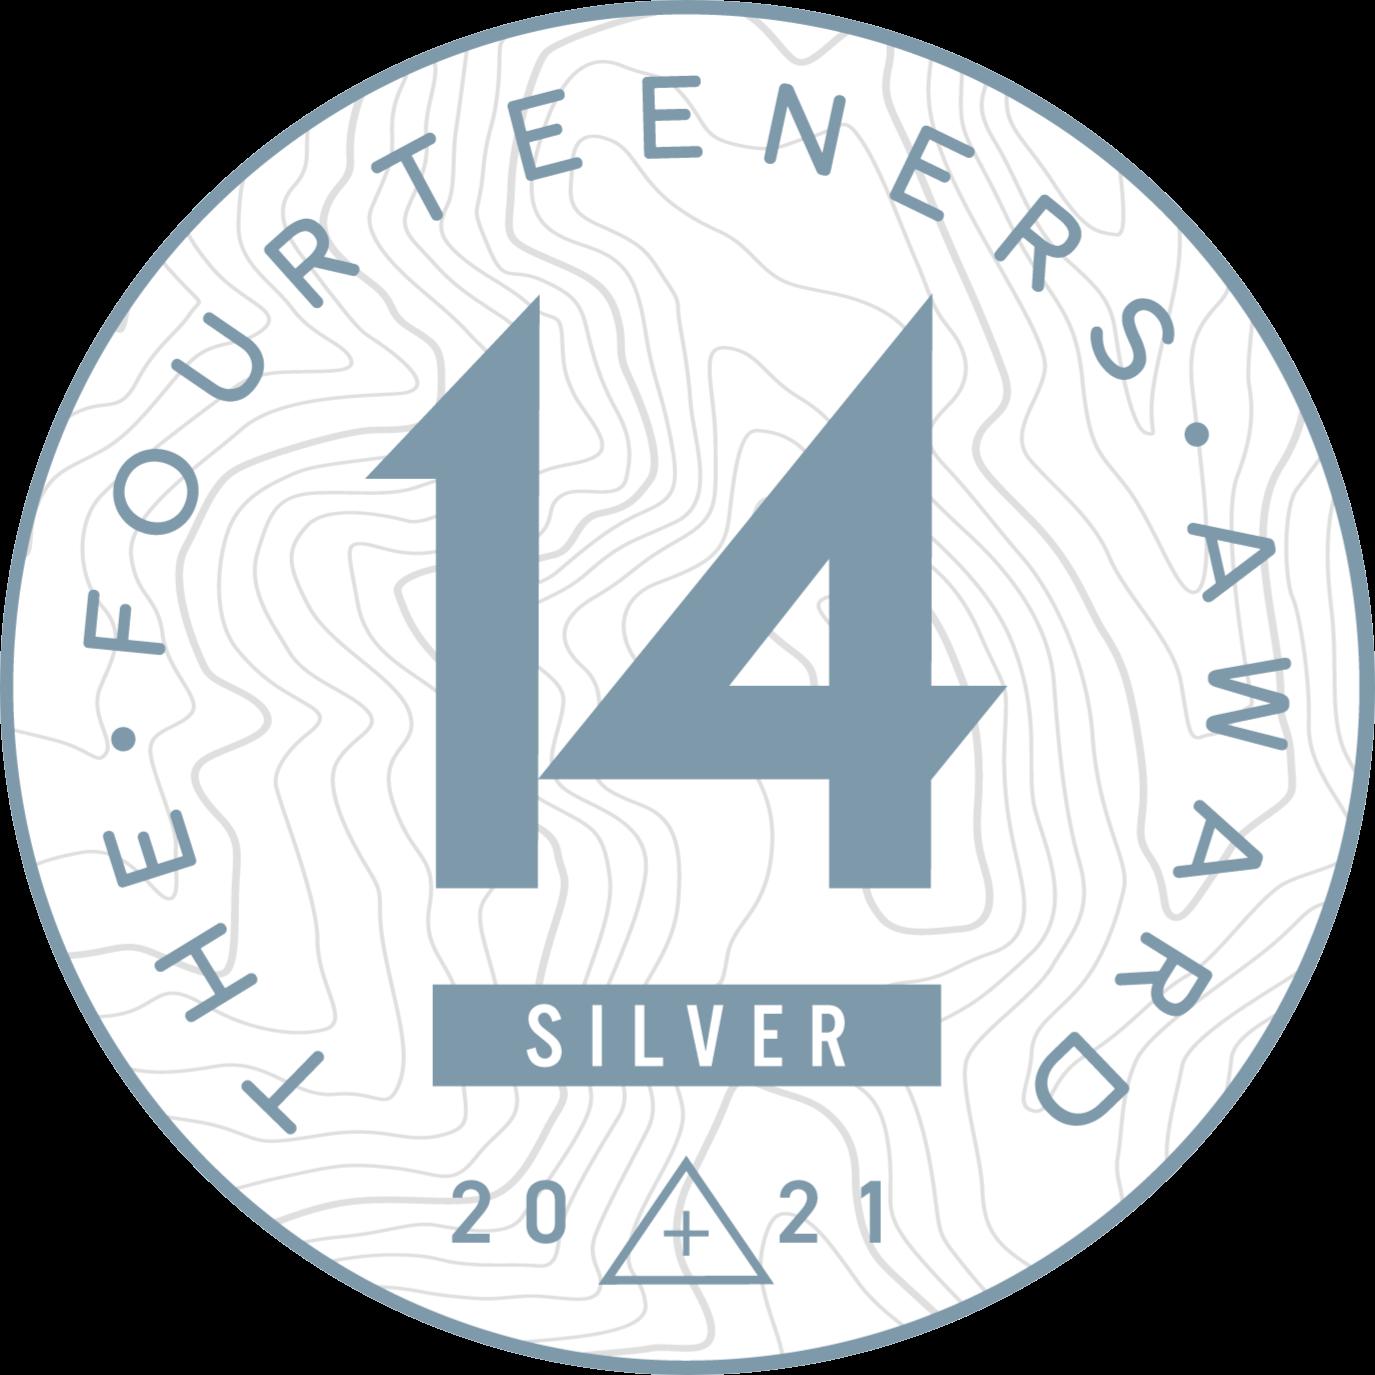 Fourteeners Award Colorado 2021